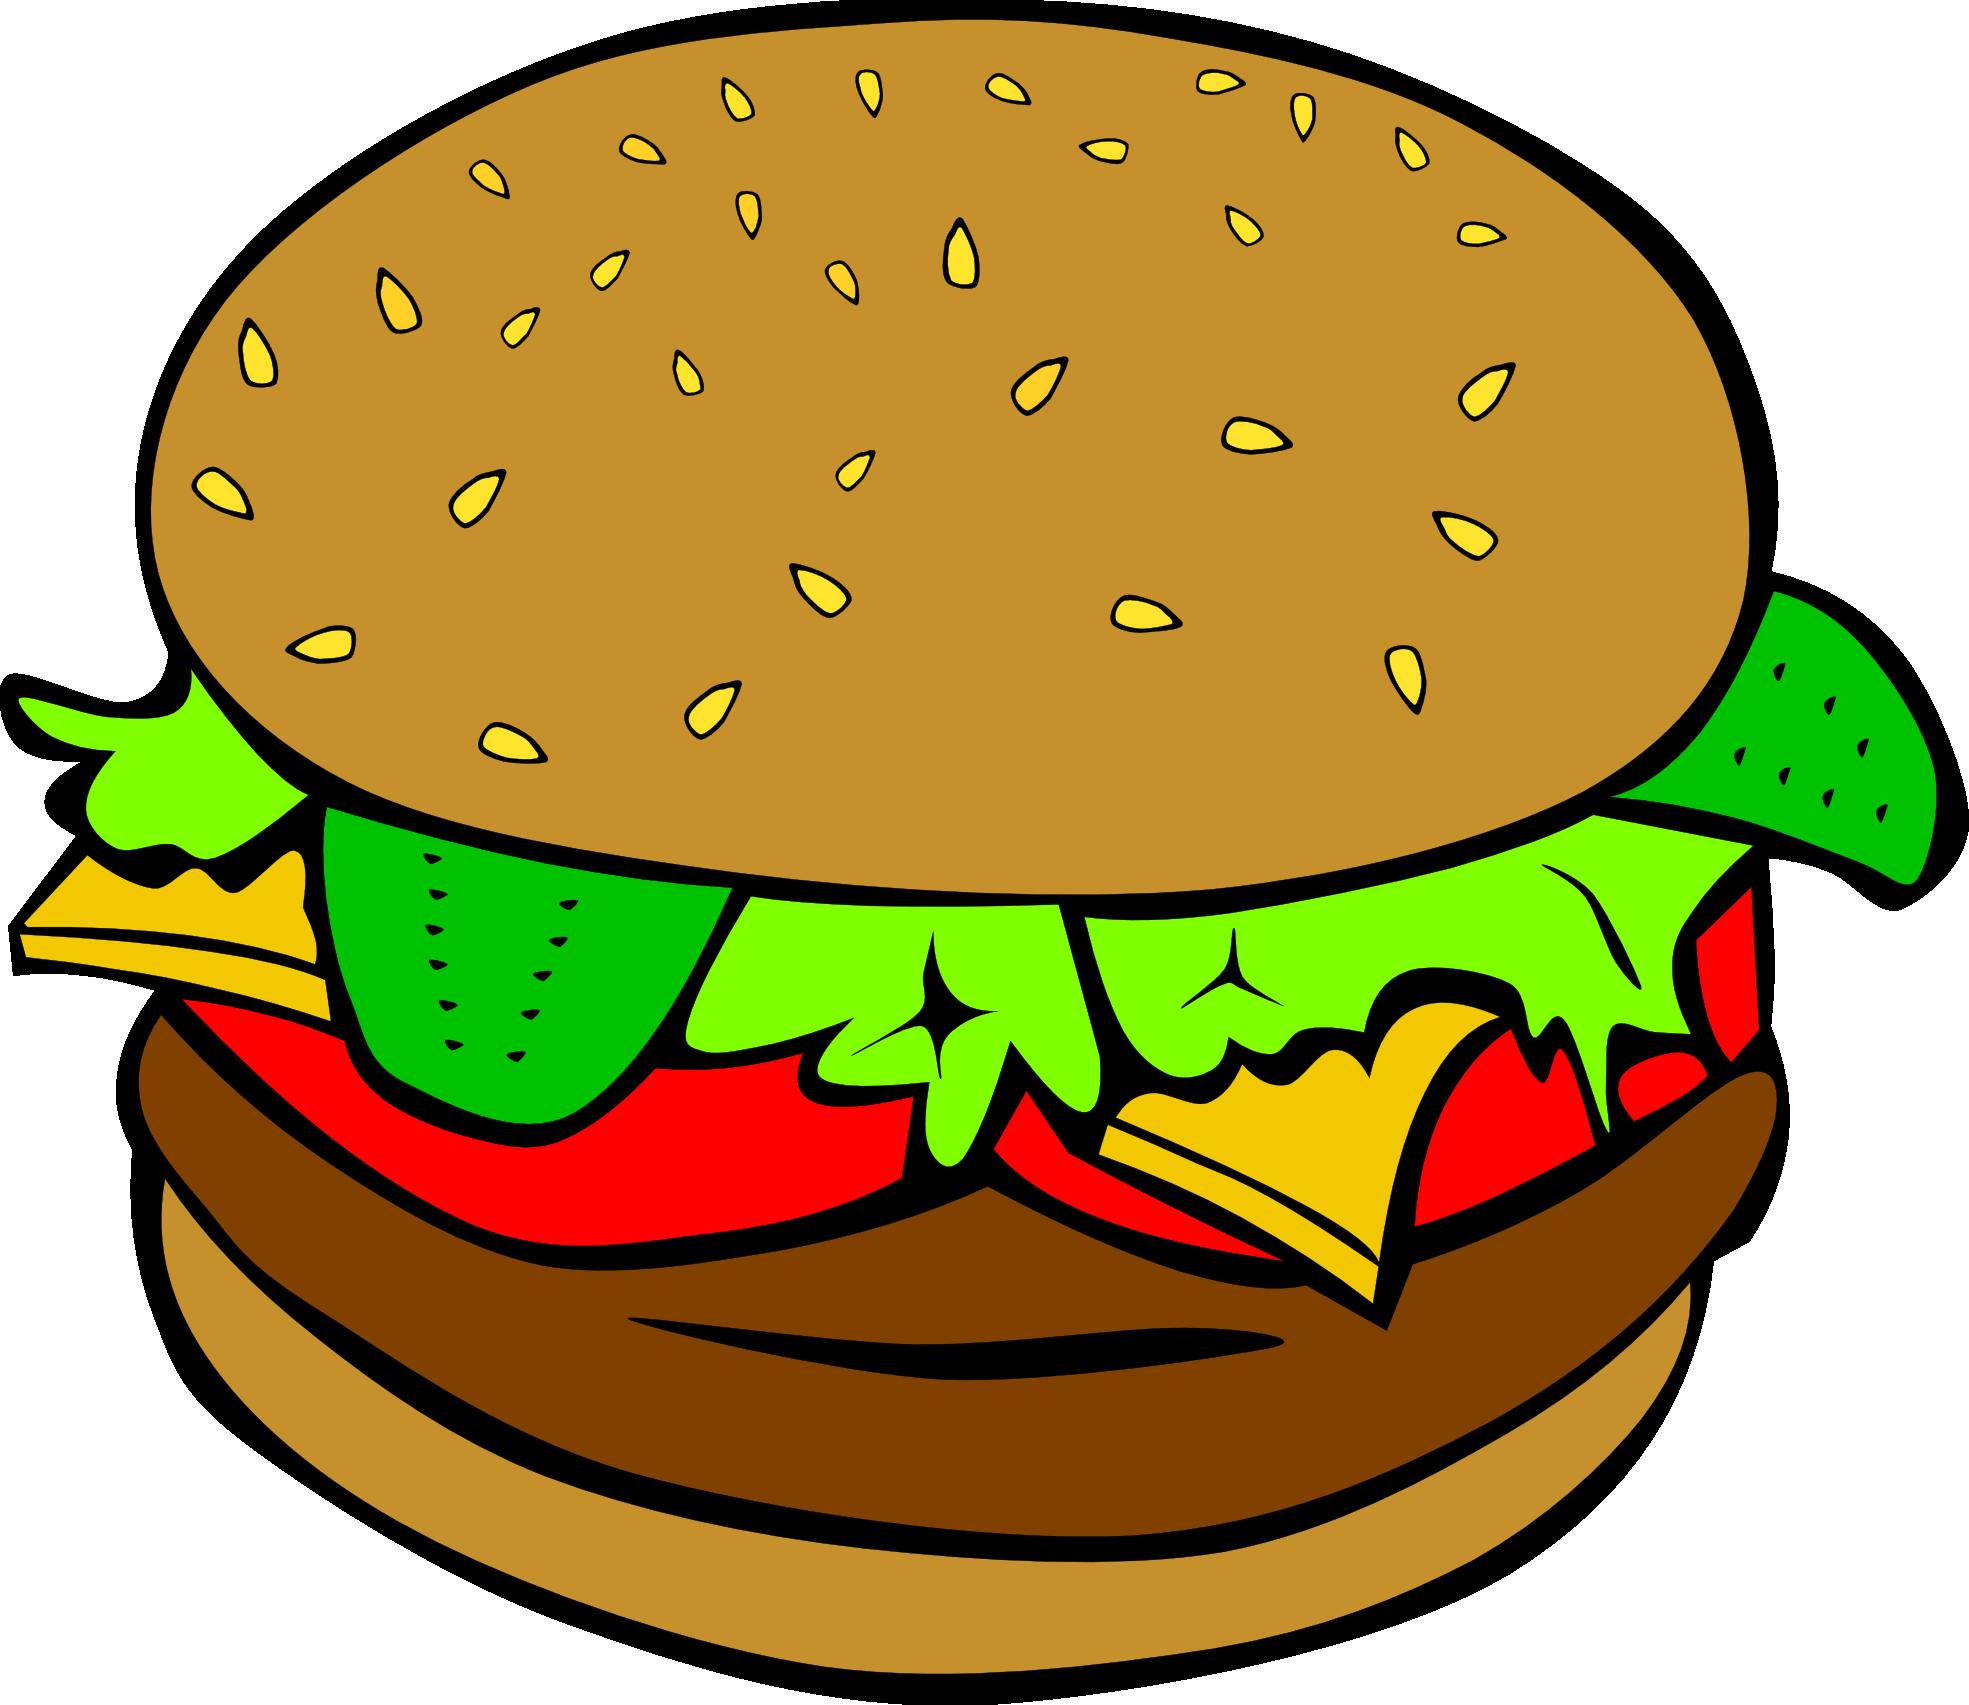 Clipart fish dinner. Food free images emoji